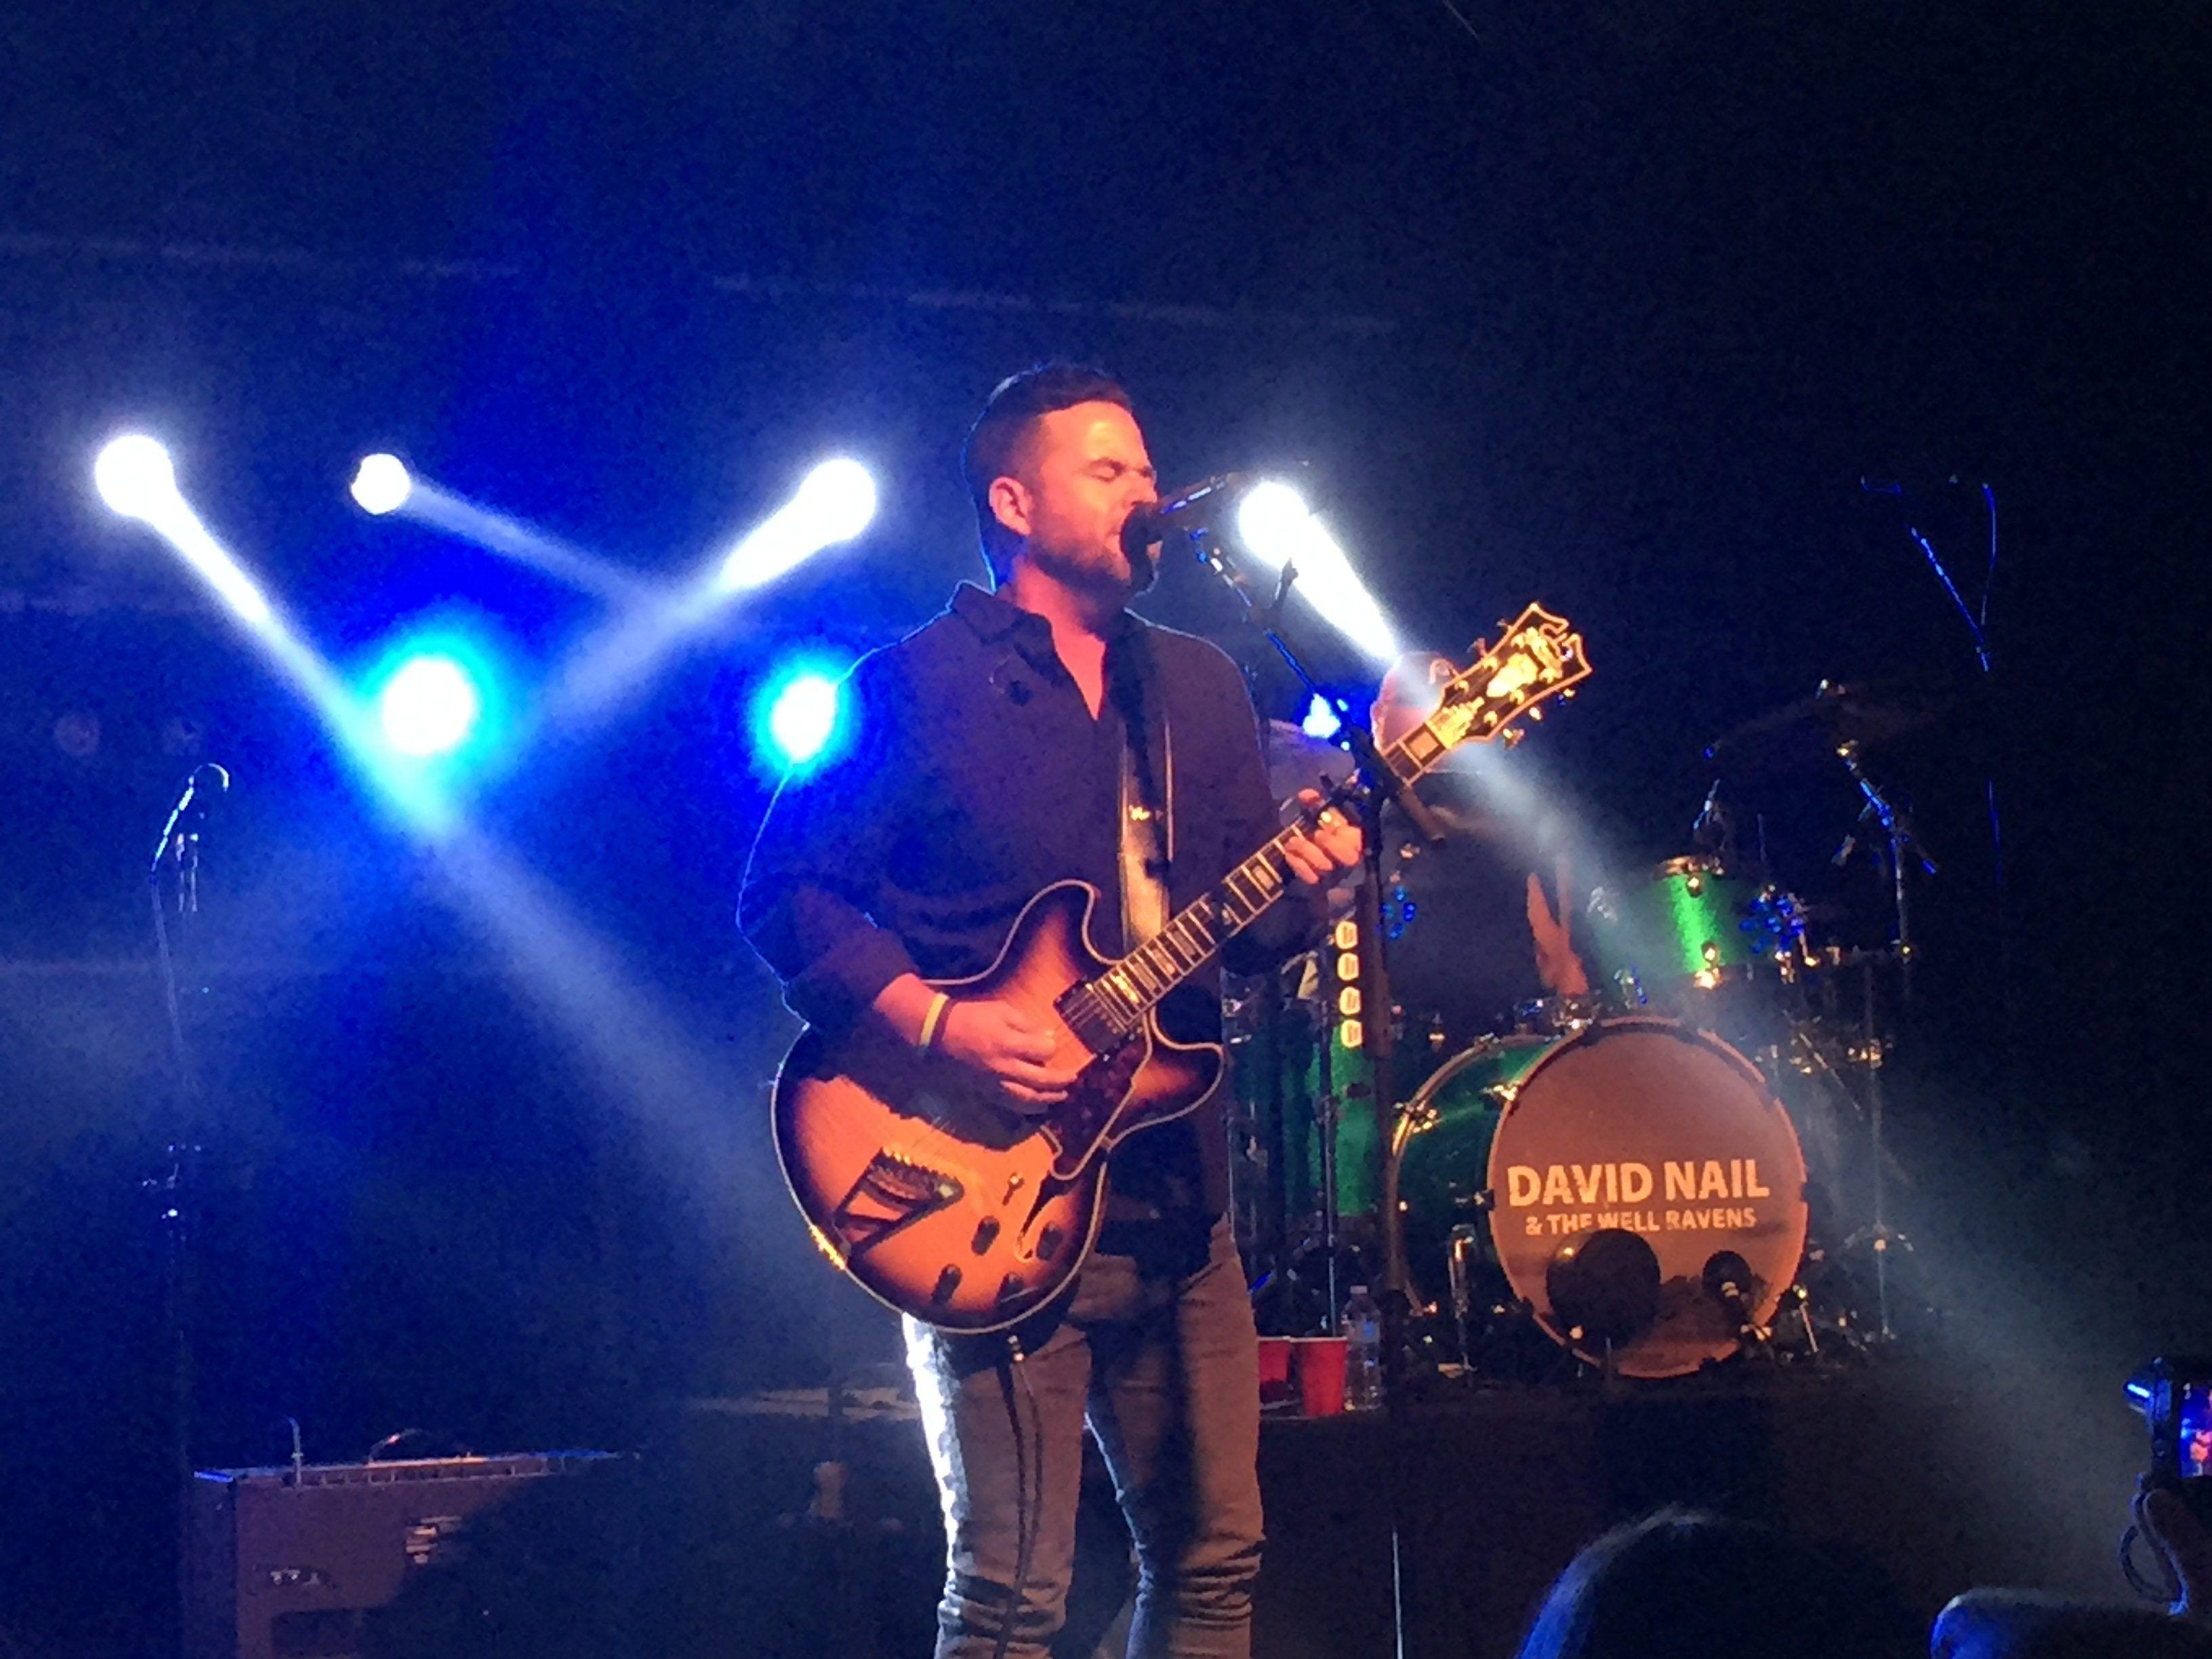 David Nail, Ryan Beaver   Concert Reviews   Pinterest